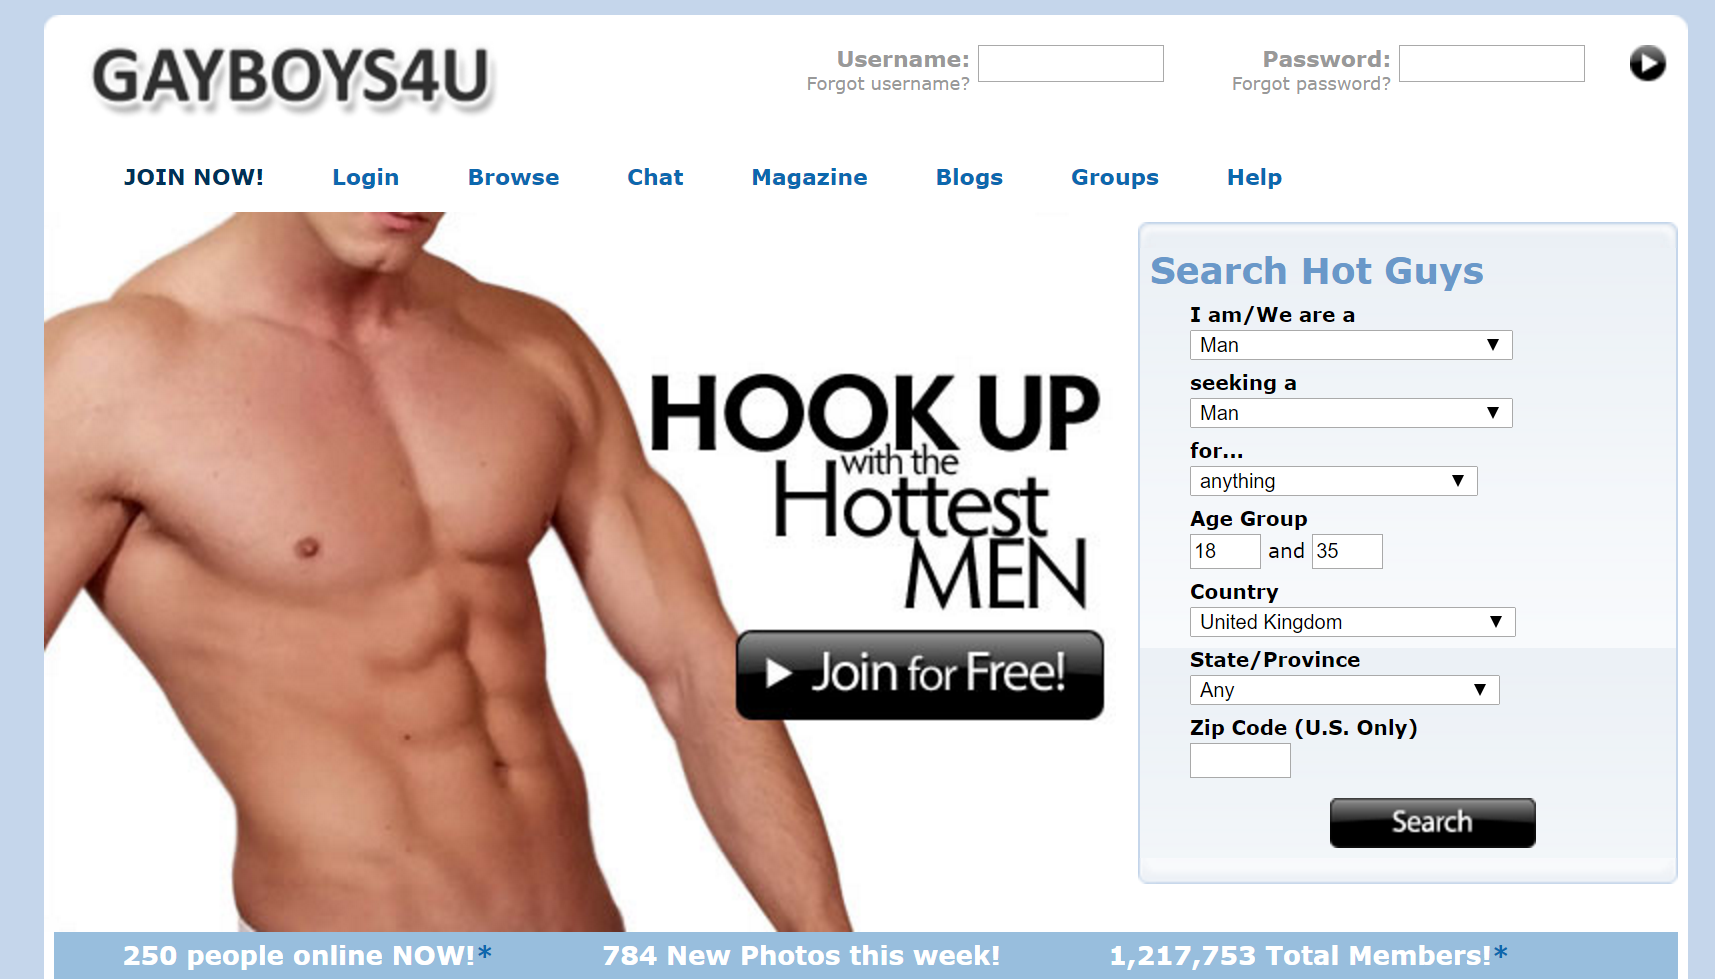 Grindr smartphone gay jack'd online dating service, gay male, png